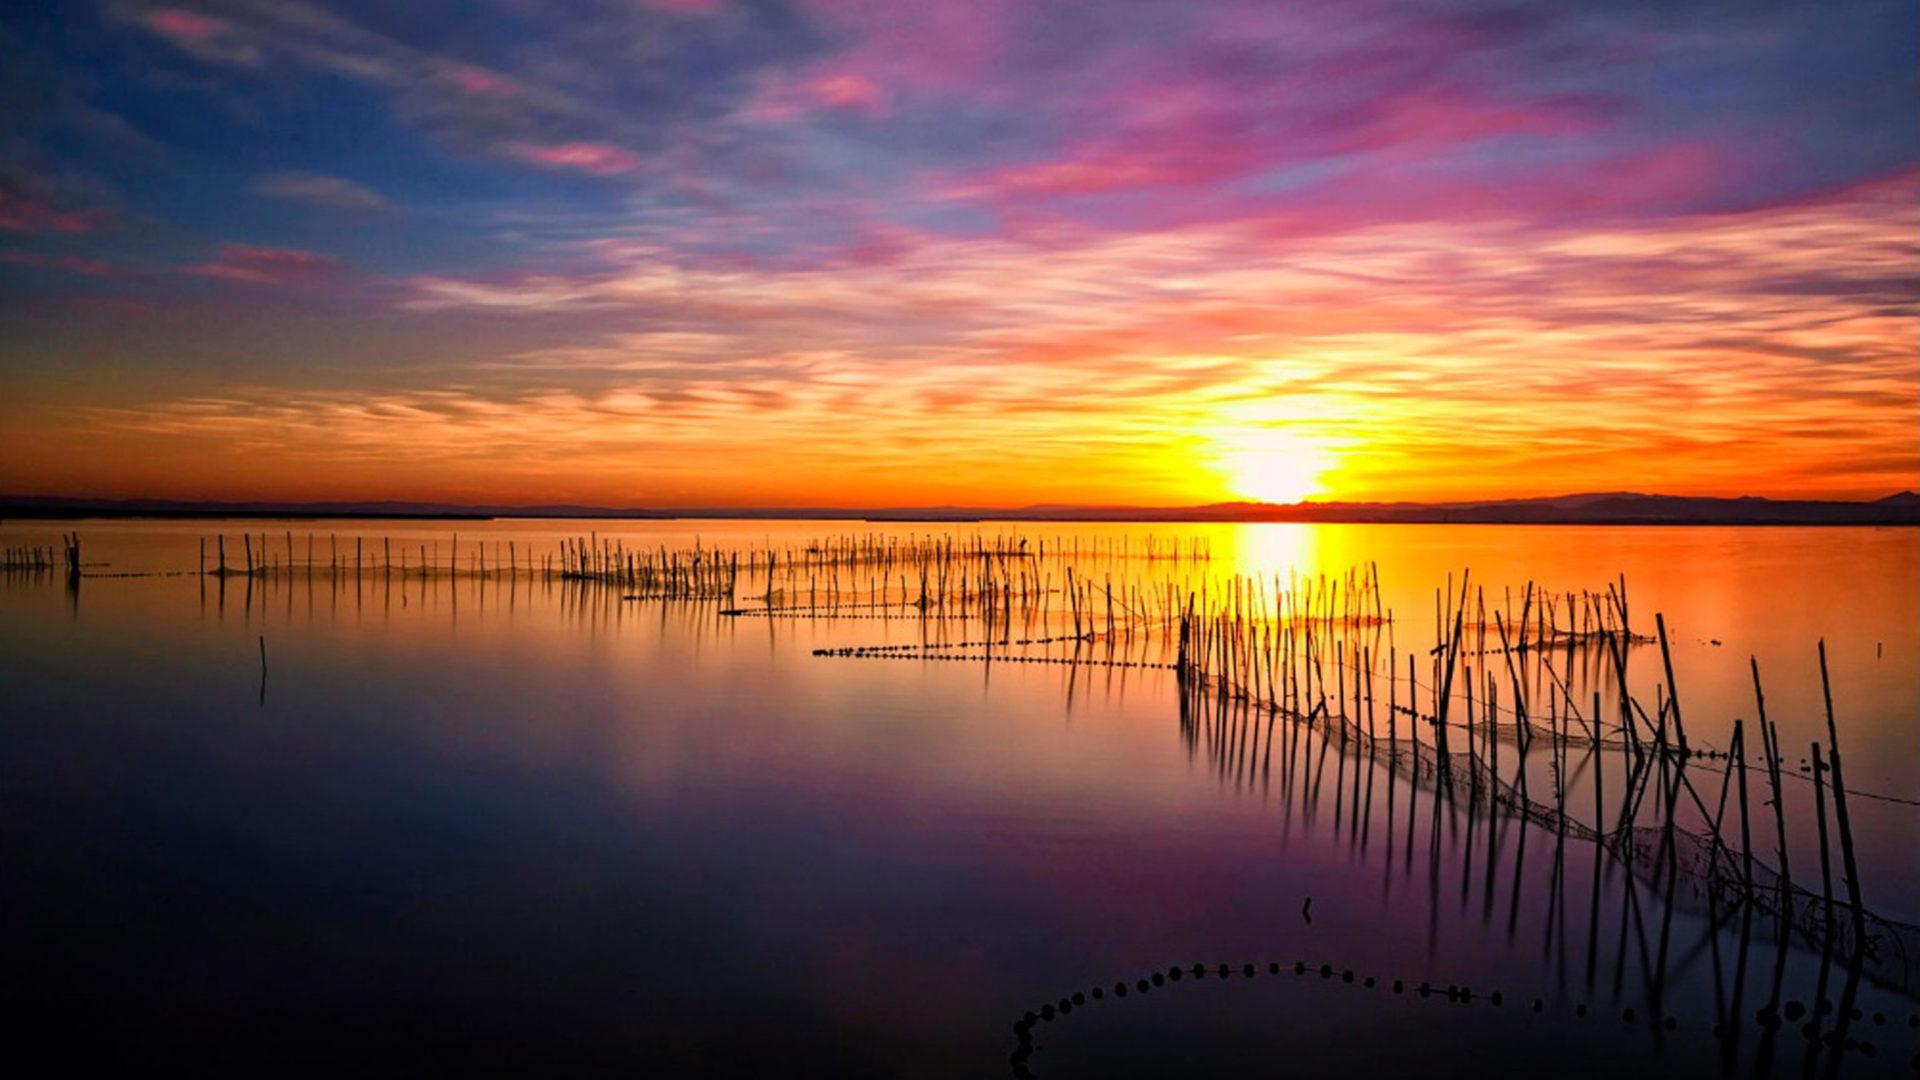 La La Land Hd Wallpaper Magical Sunset Albufera Lake Hd Wallpaper Download For